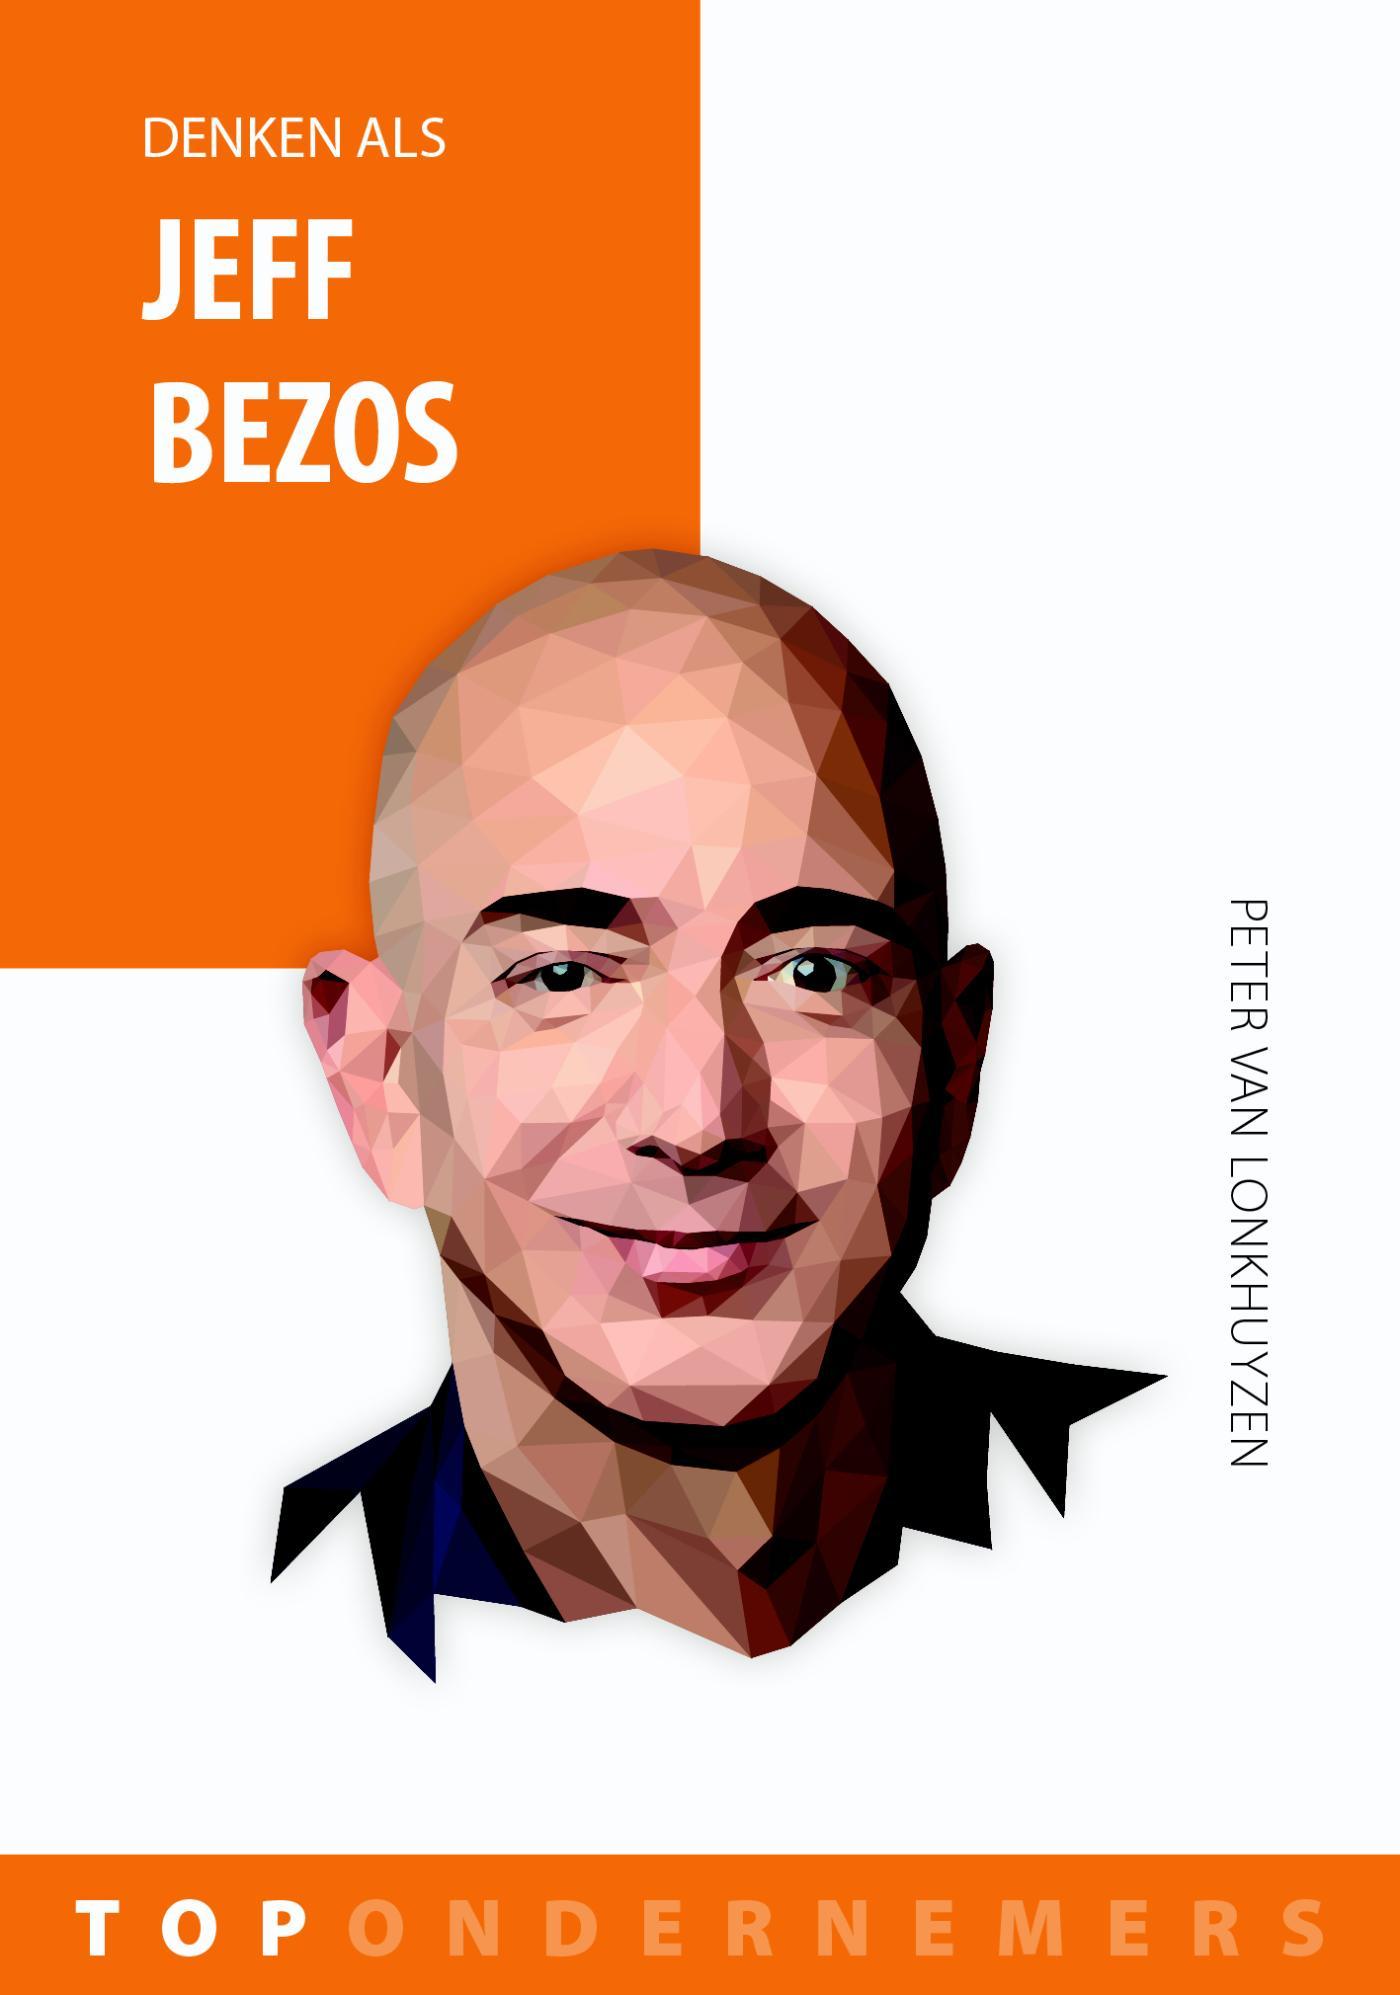 Denken als Jeff Bezos